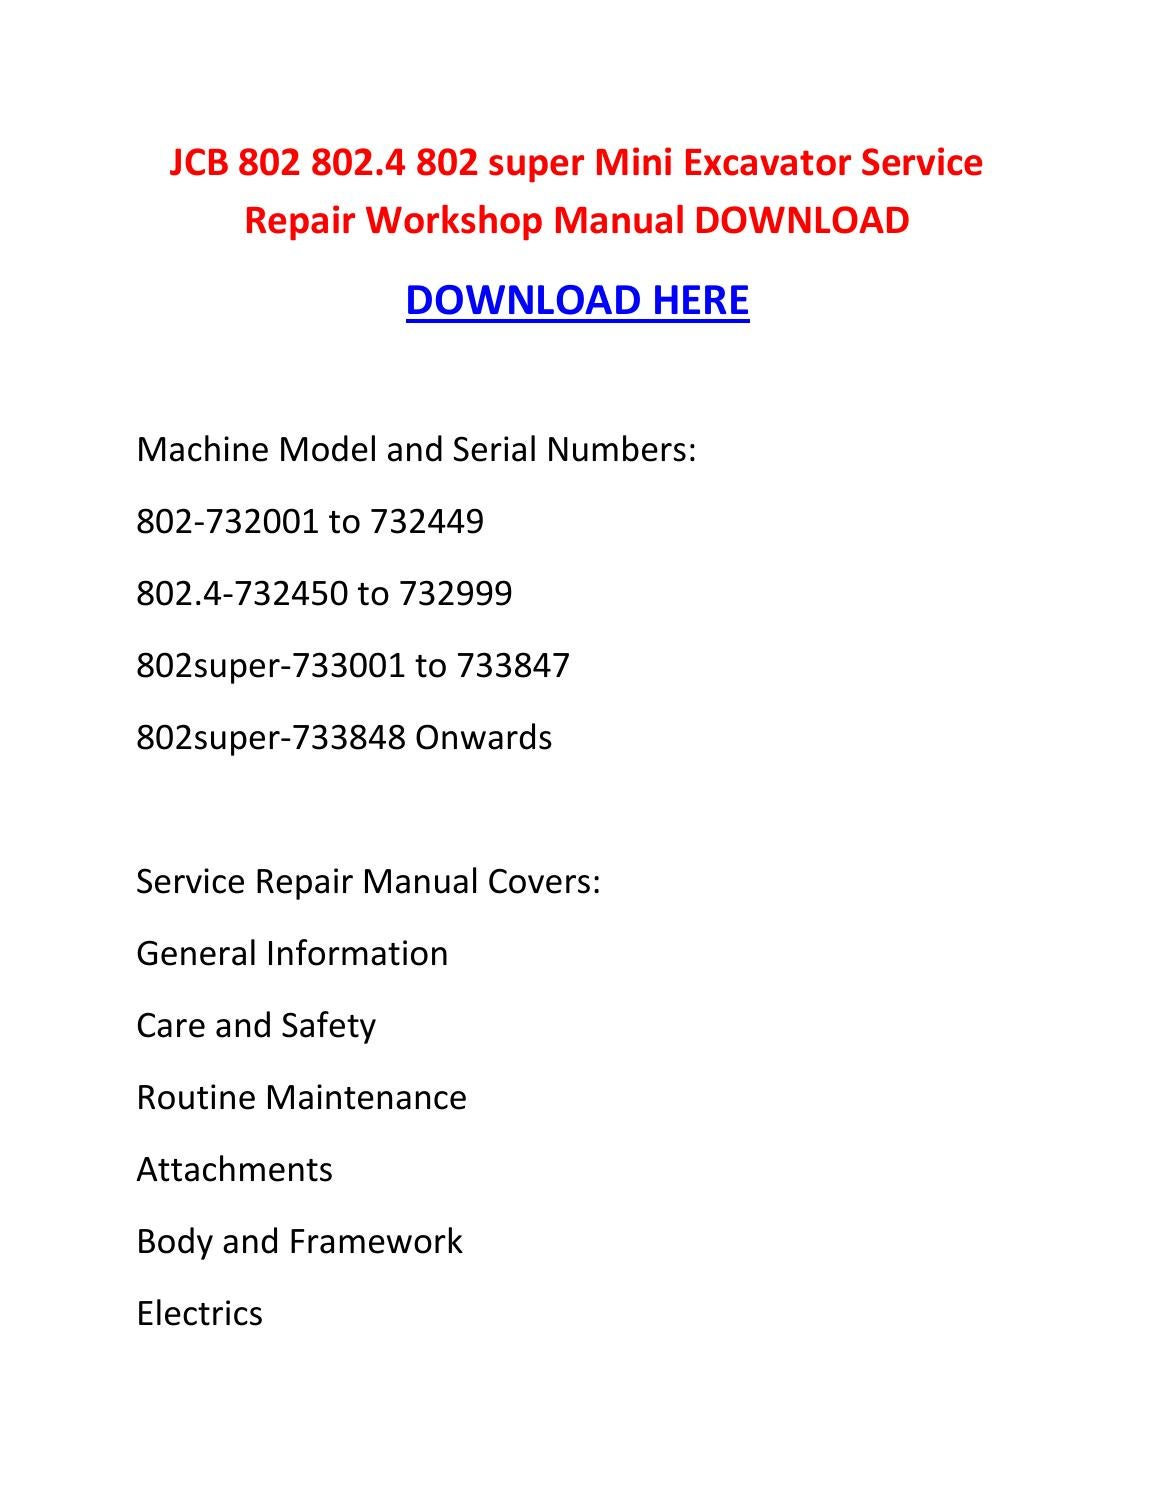 Jcb 802 802 4 802 super mini excavator service repair workshop manual  download by suzettespoonerowqbdt - issuu